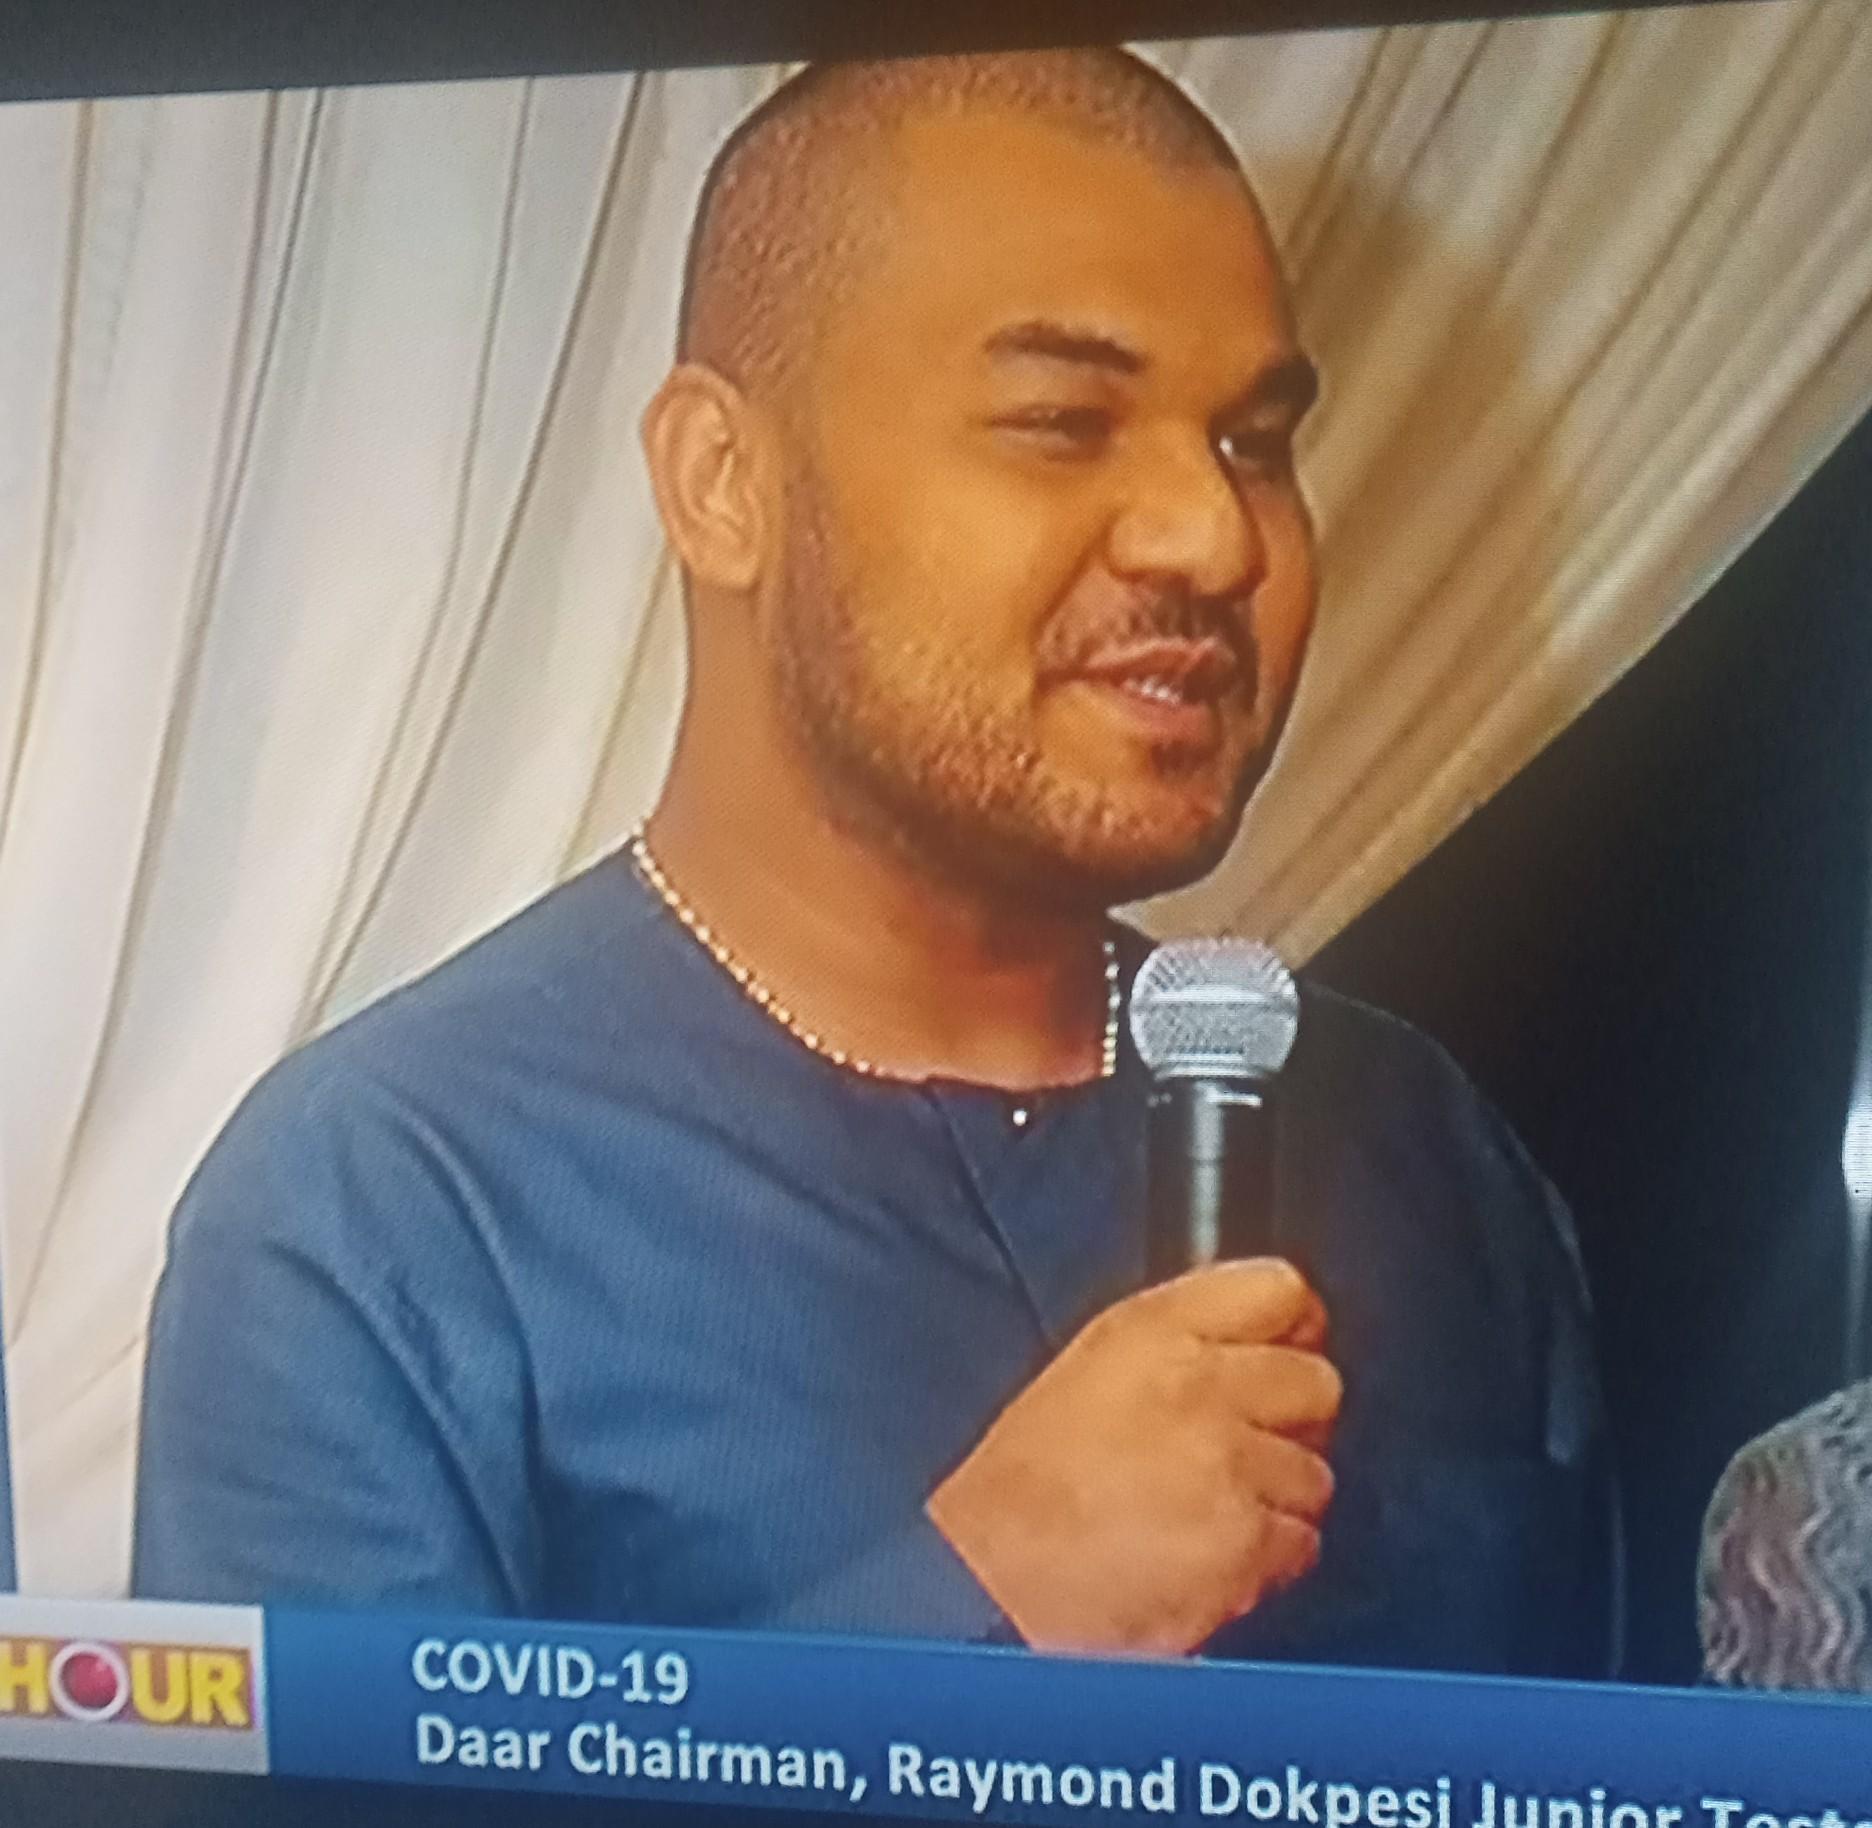 Raymond Dokpesi Jnr. of DAAR Communications tests positive for COVID-19 as Atiku-Abubakar's Son Recovers